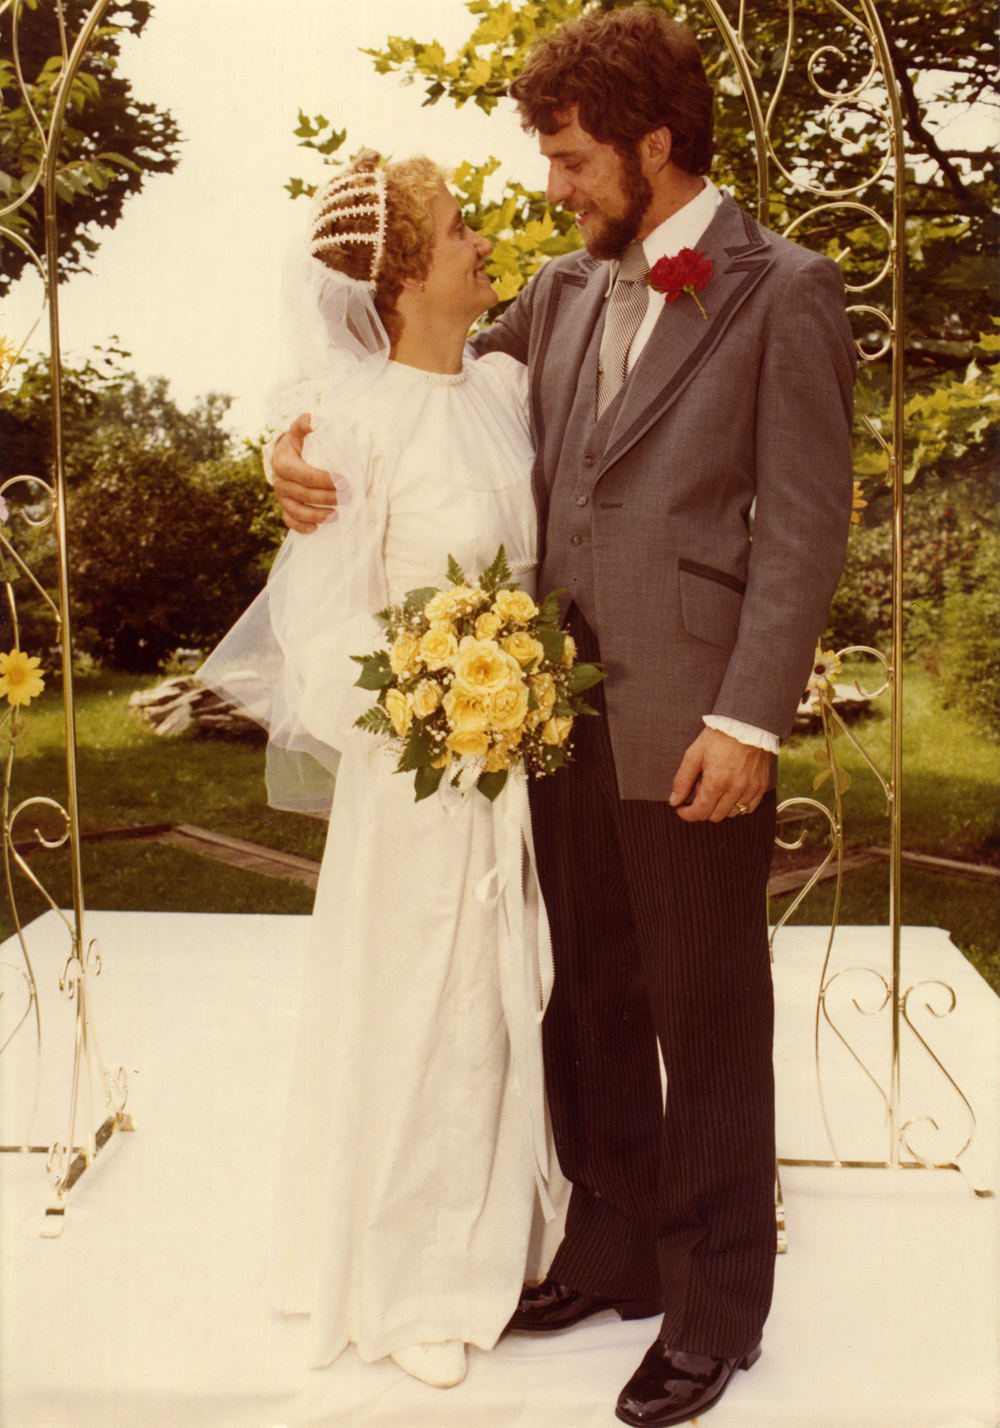 Richard & Gerri Fenner, Crane Park, Kalamazoo, MI, 19 Aug. 1979.